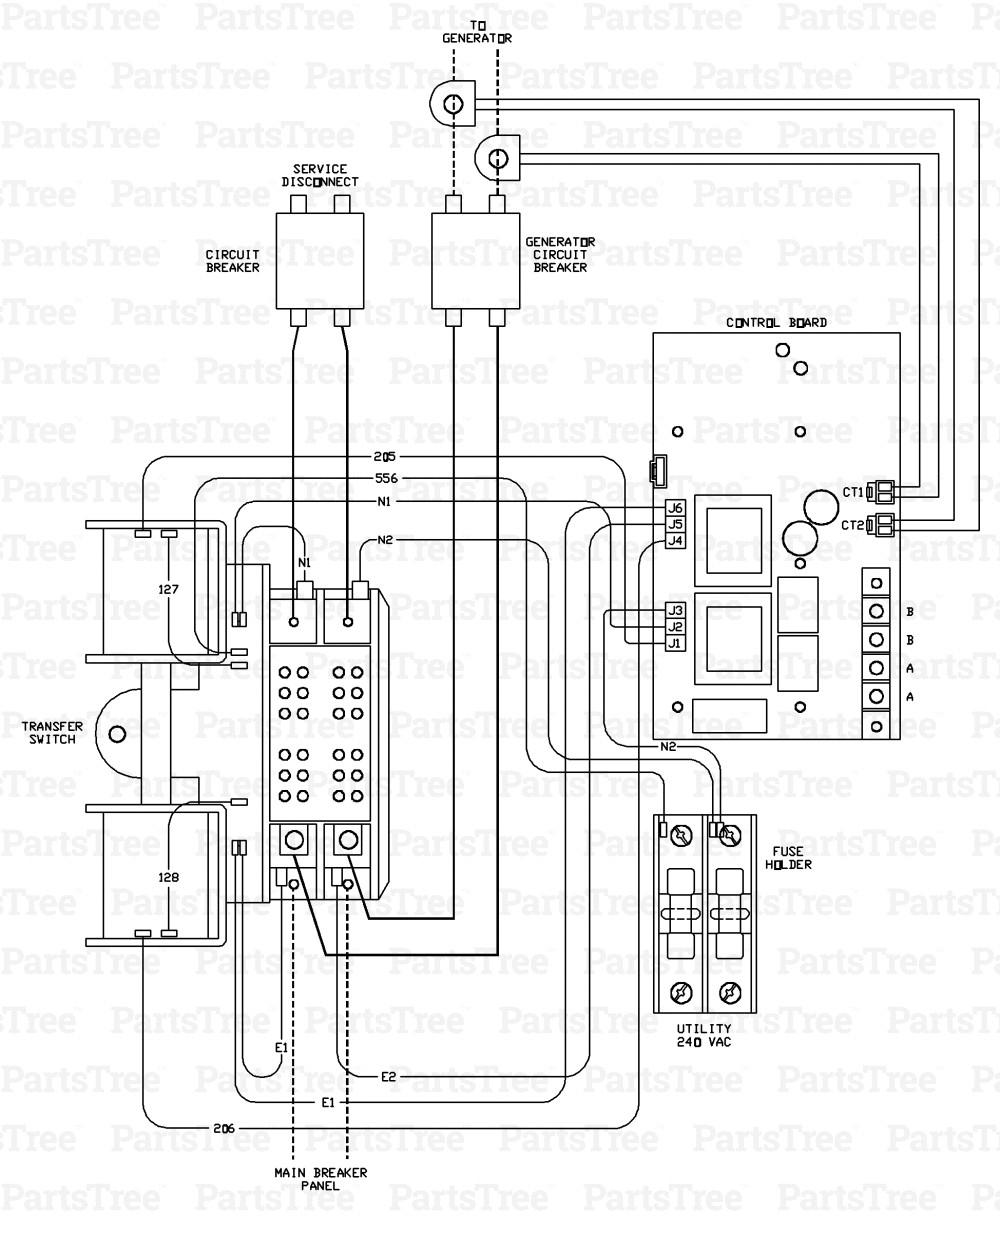 Generator Automatic Transfer Switch Wiring Diagram